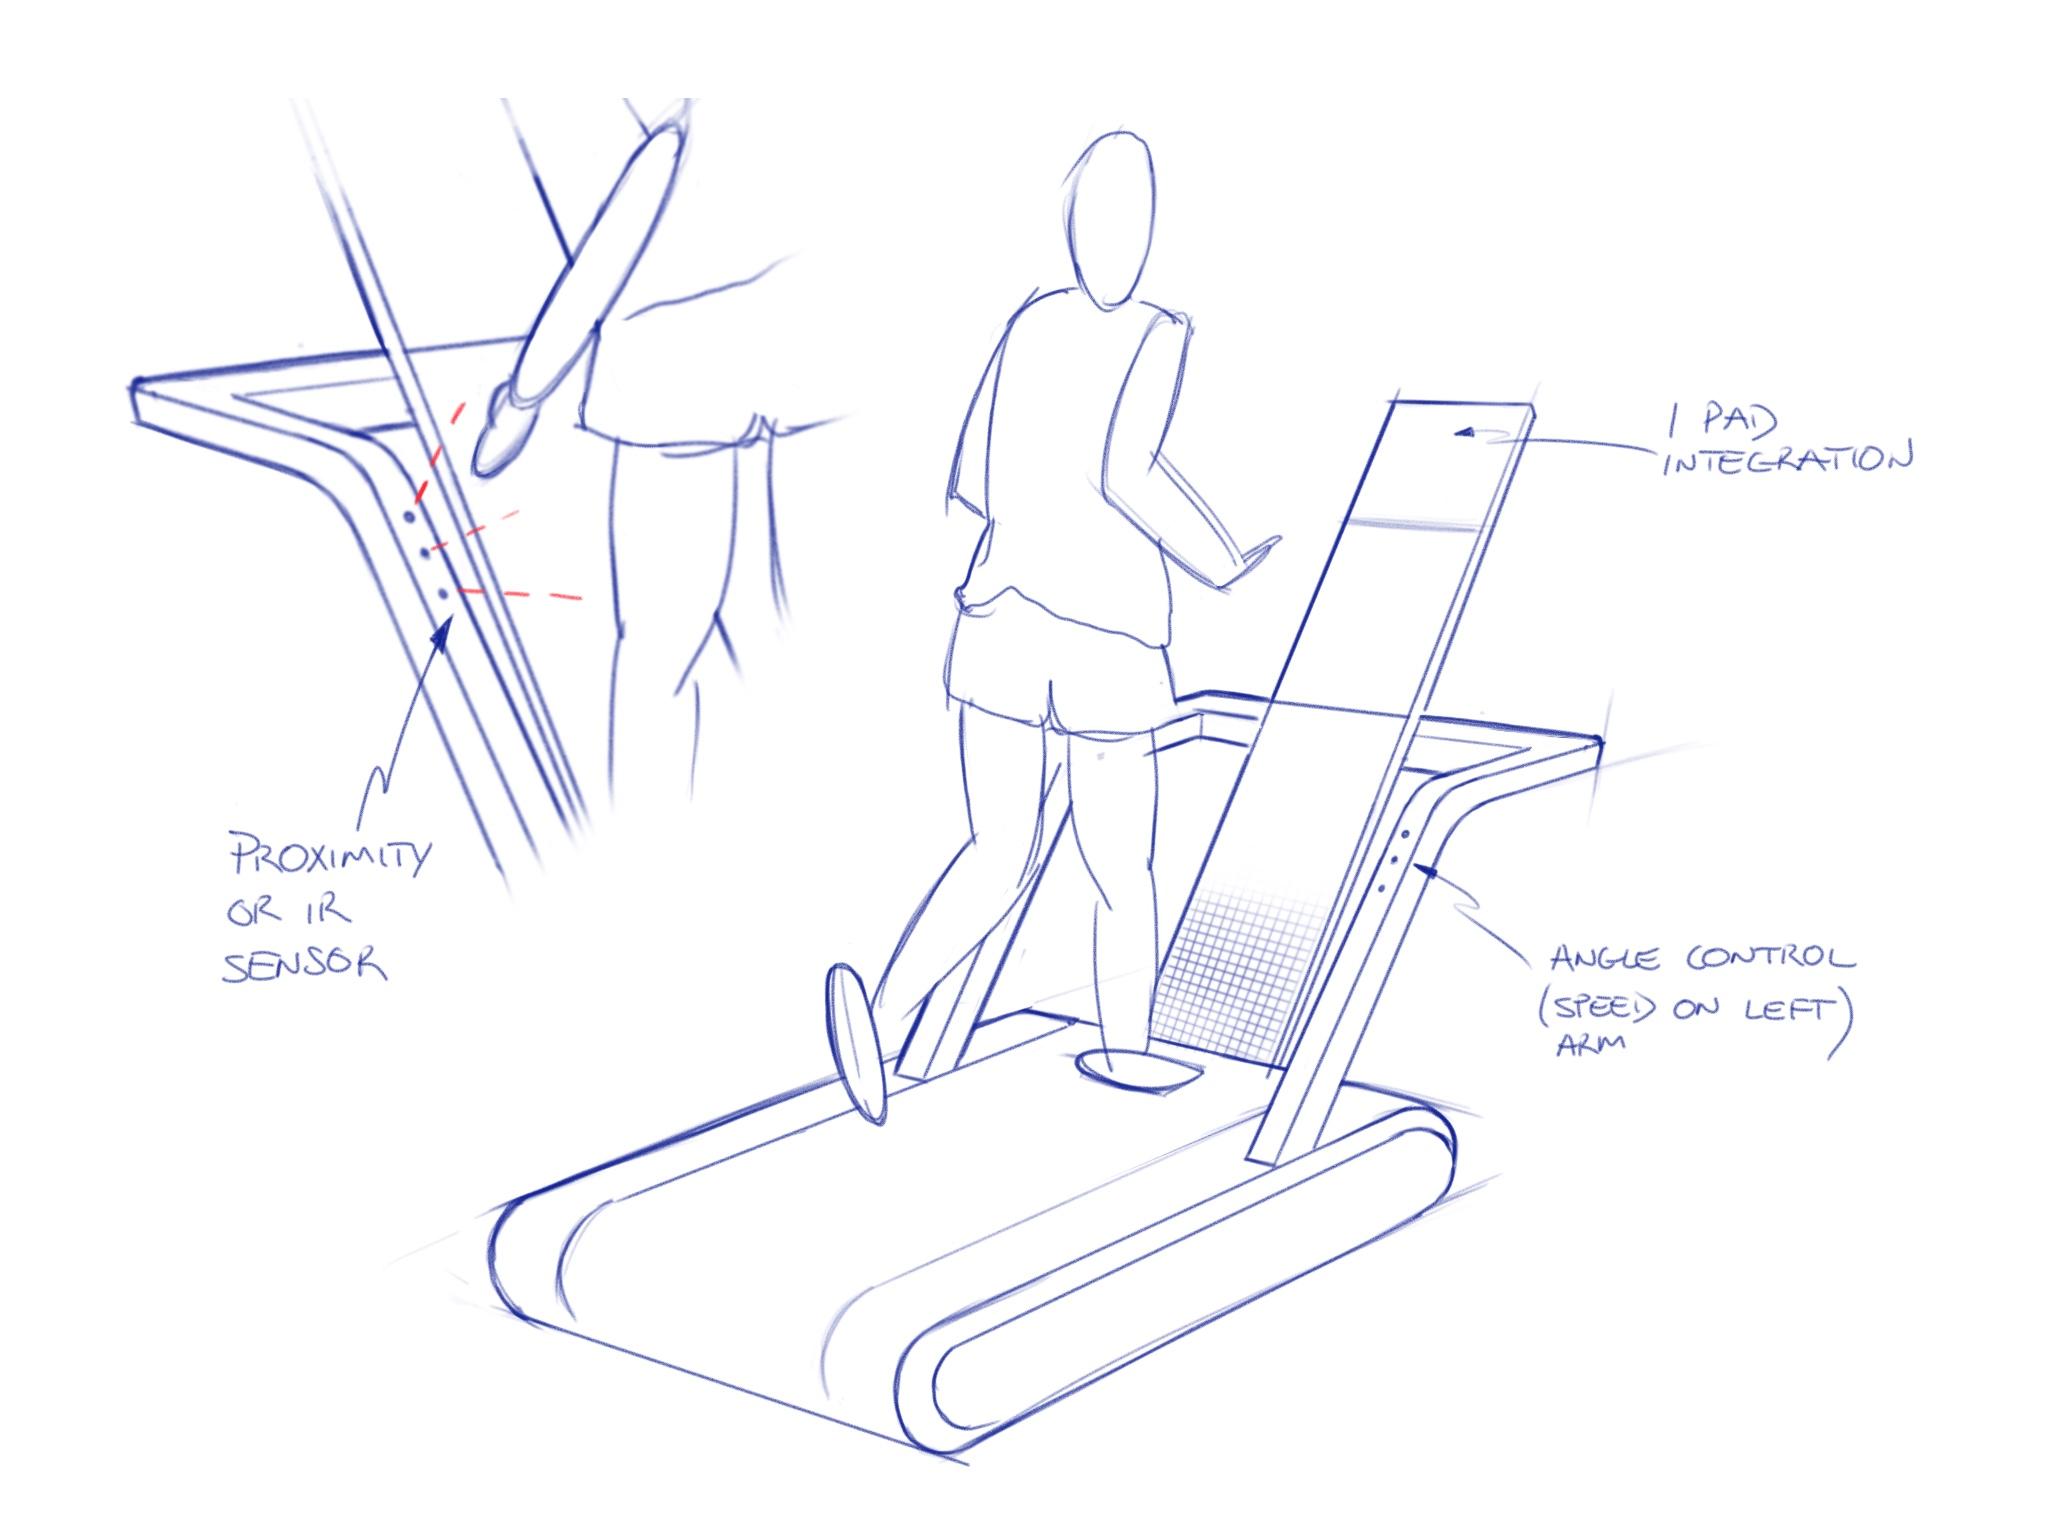 Treadmill_Round_1a 3